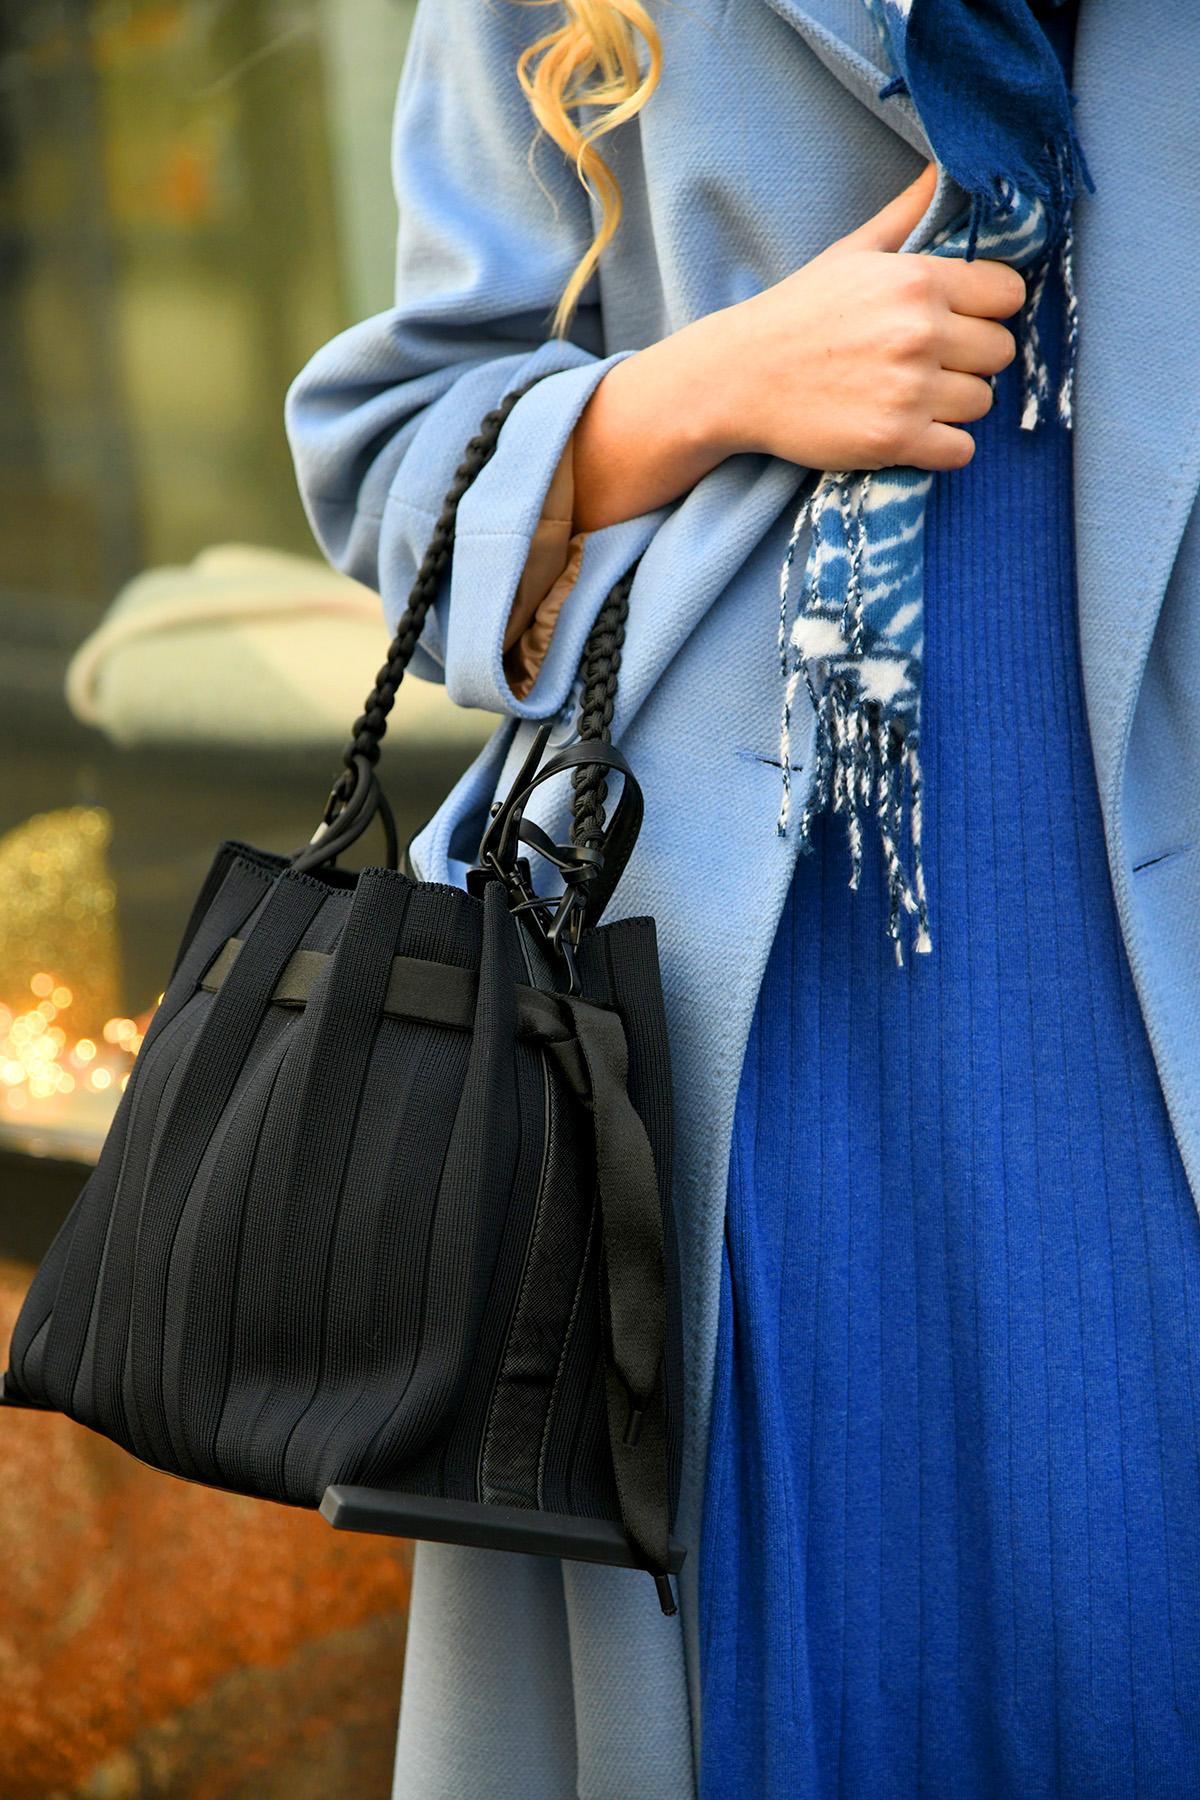 Extravagant shopping: Pervoi